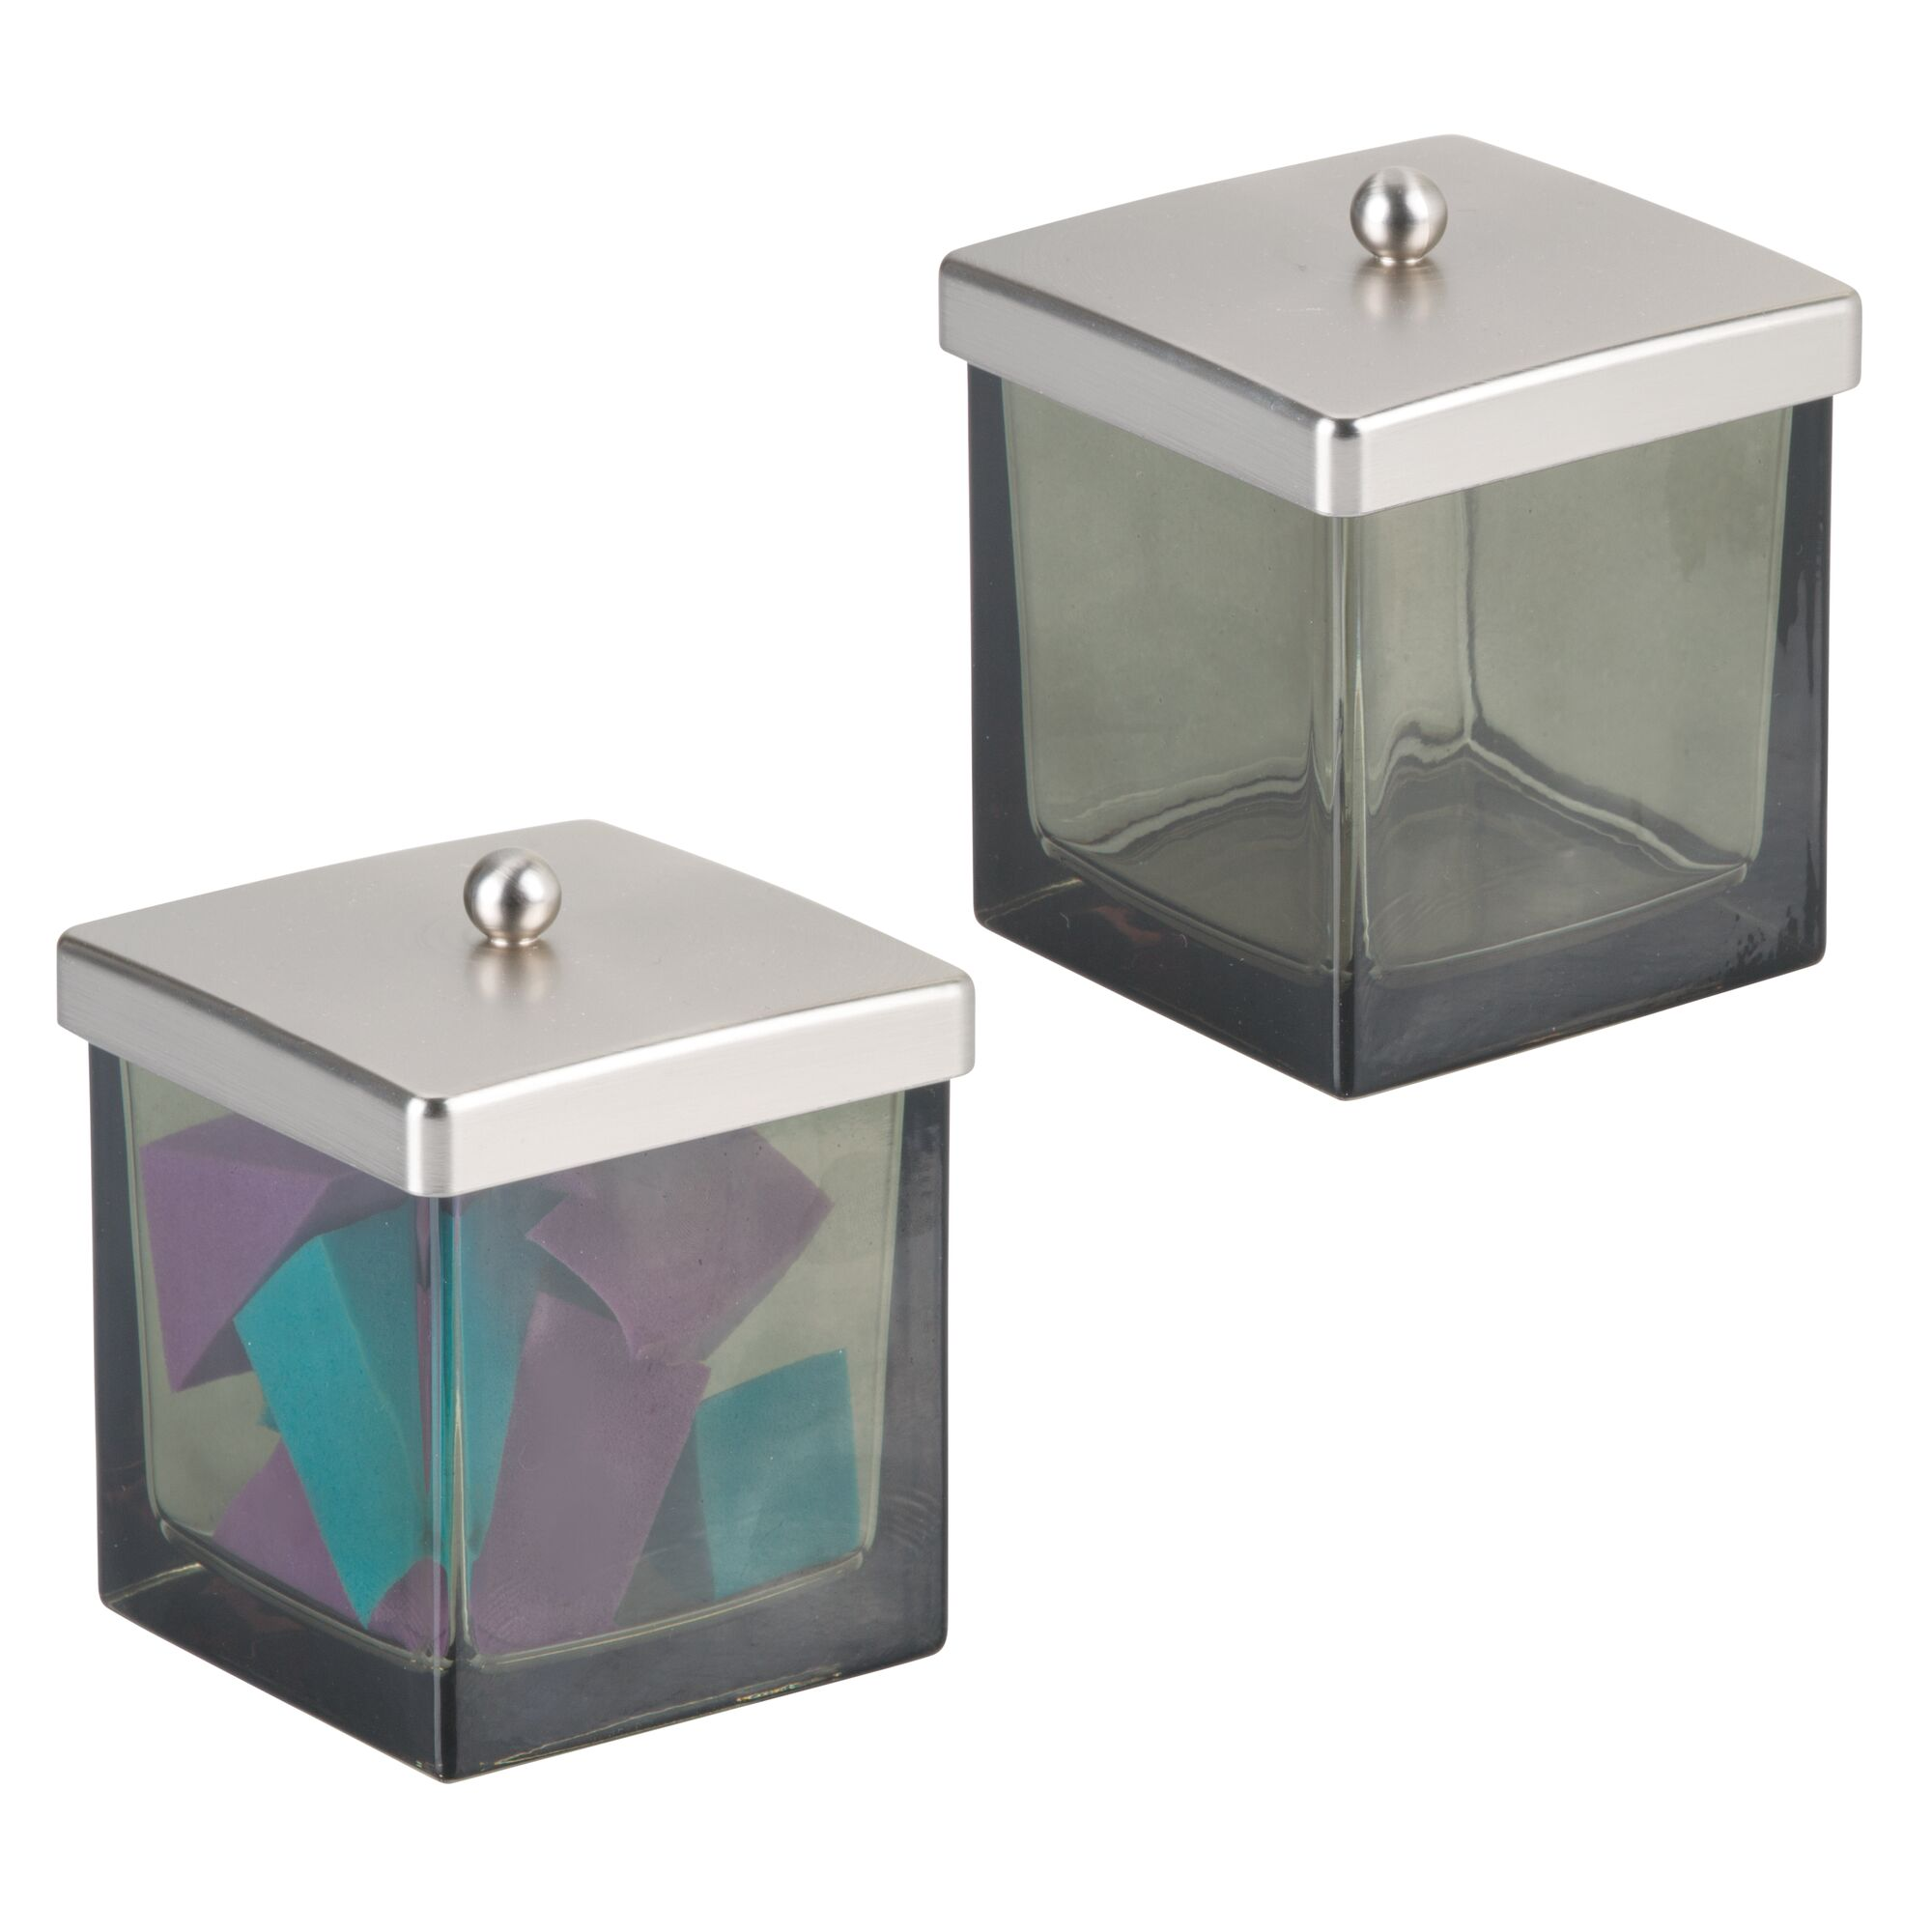 mdesign glass storage apothecary jar for bathroom vanity, 2 pack | ebay